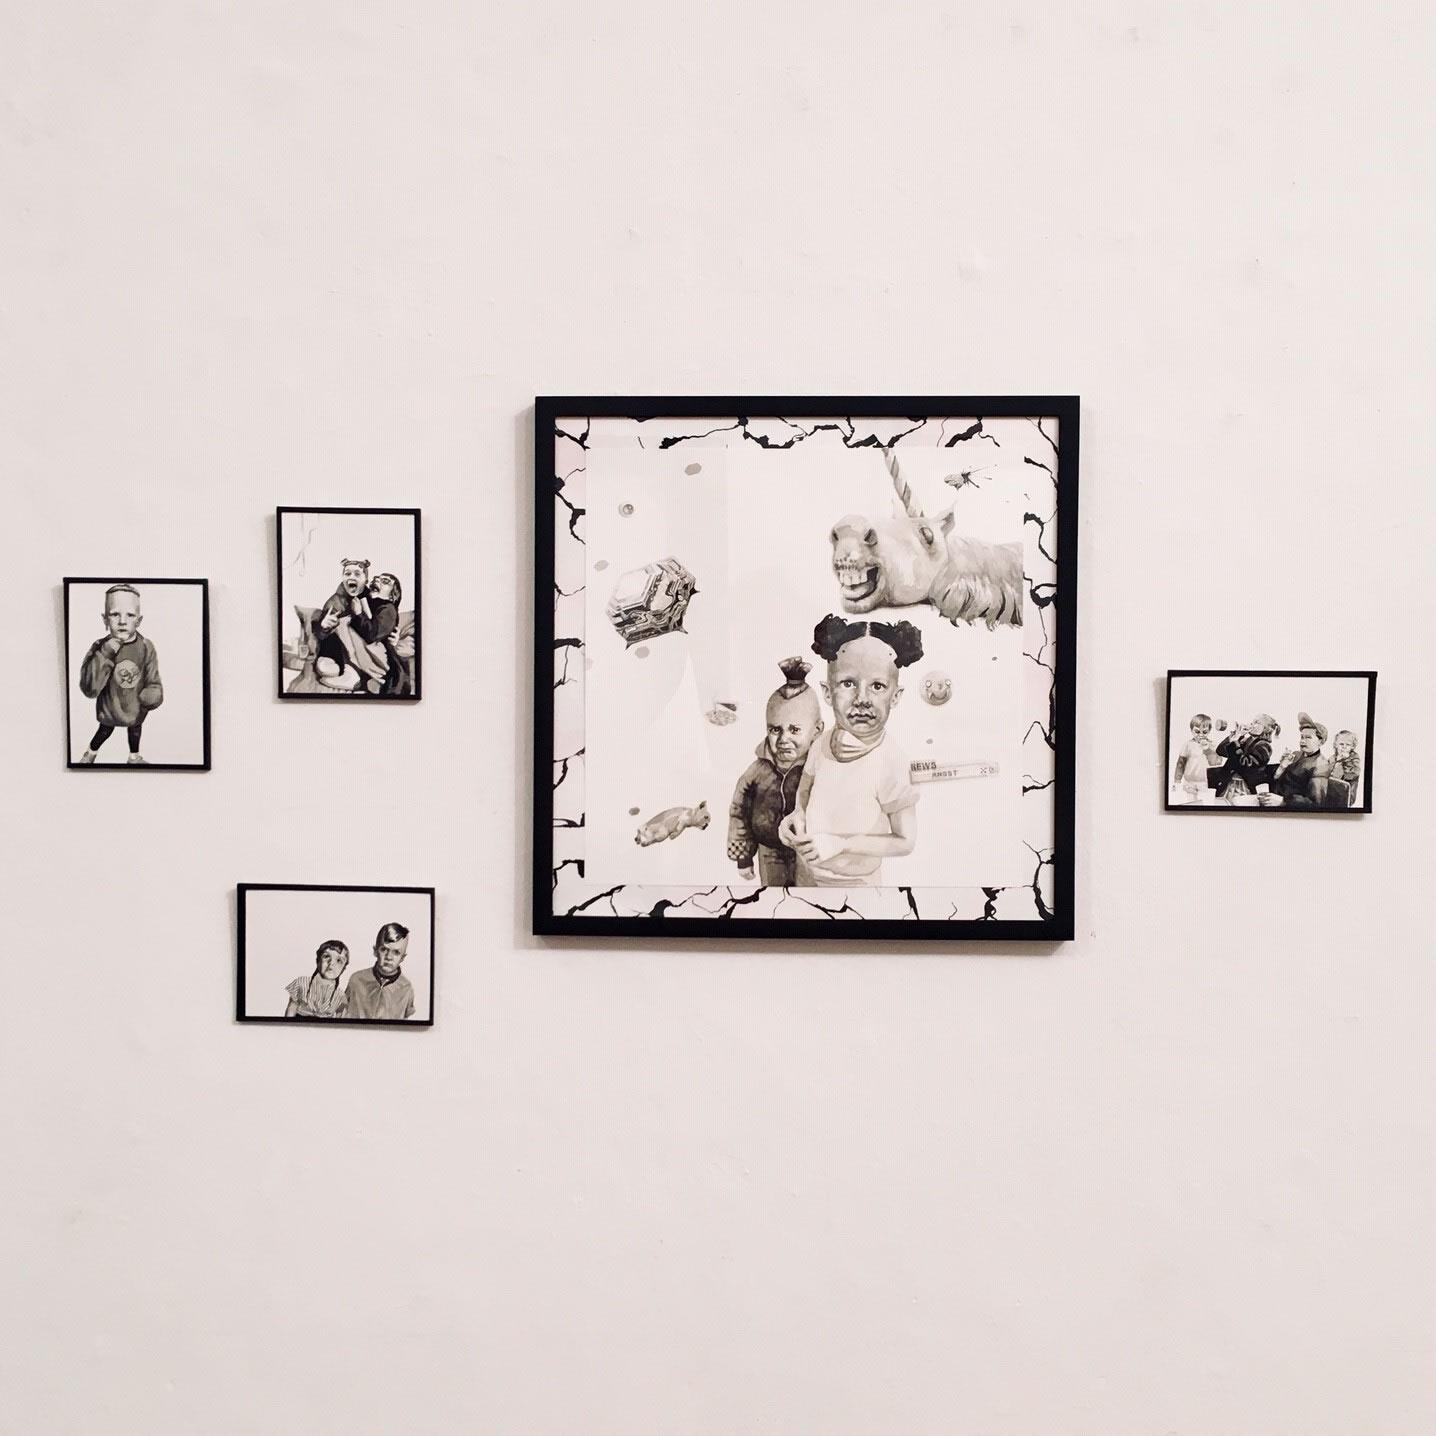 Annemarie Arzberger | Kinderparty | Aquarelle 2018 | unheimlich heimelig | Galerie3